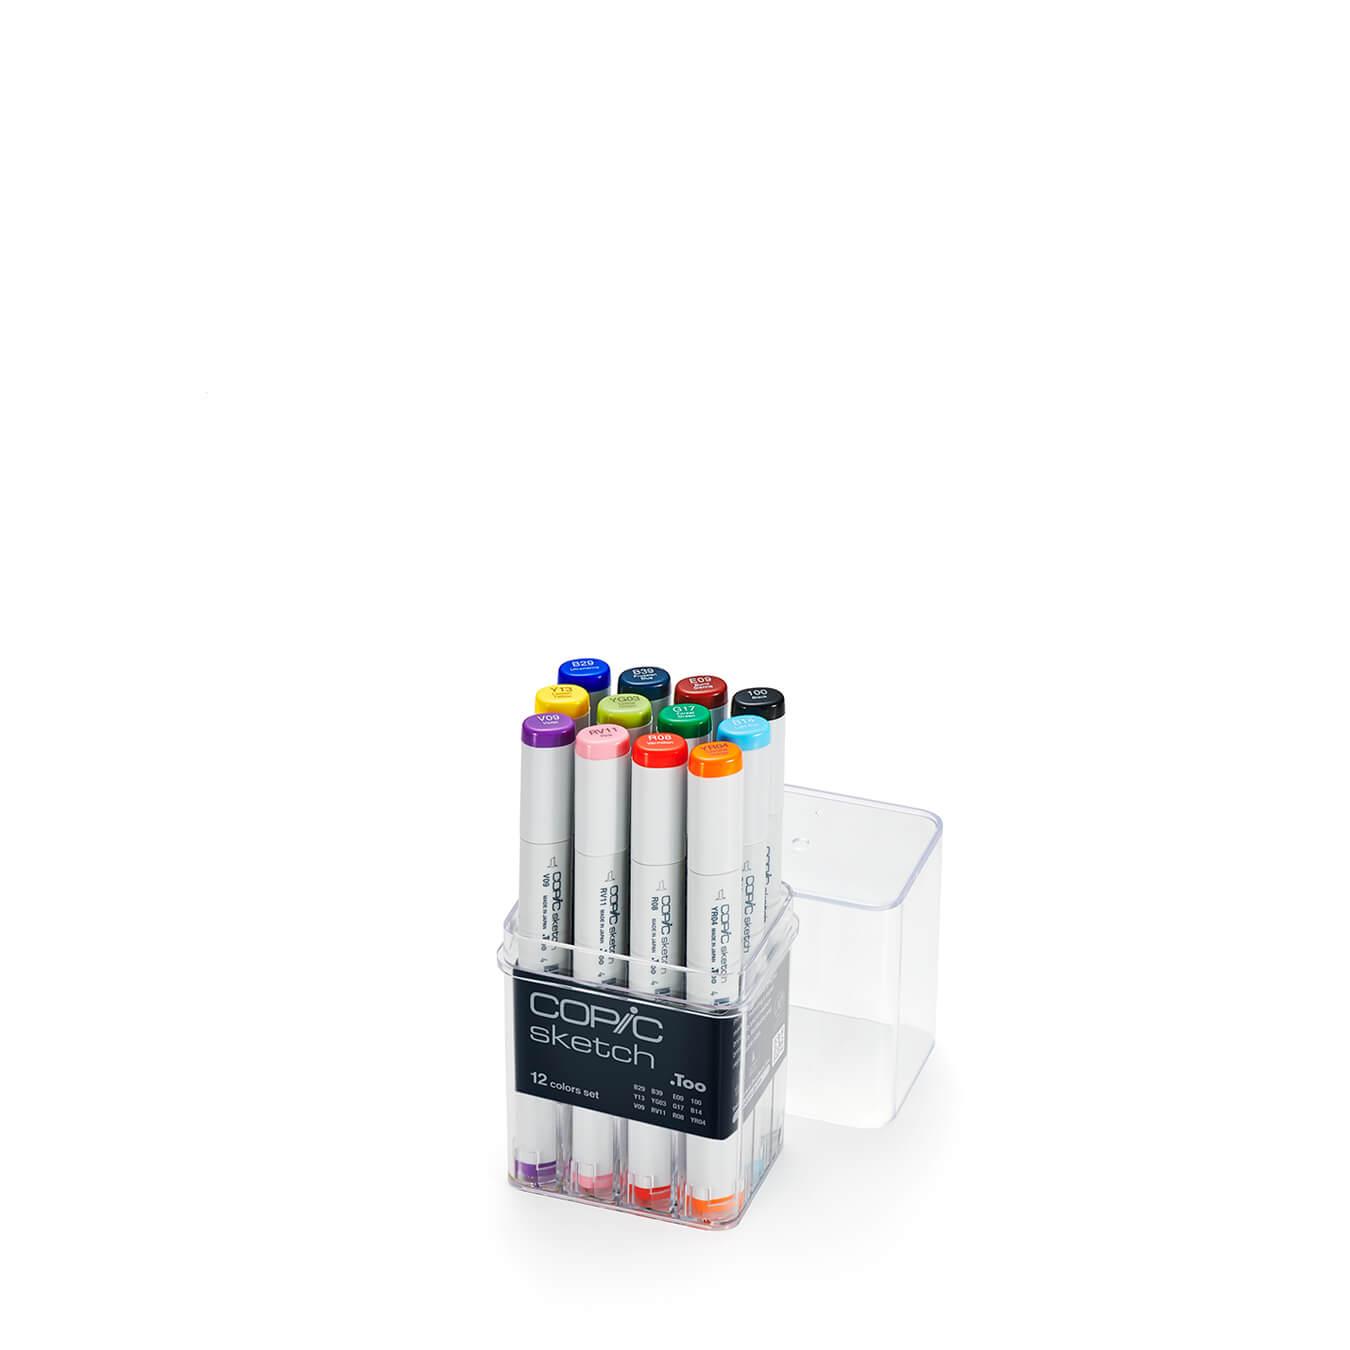 Copic Sketch 12 colors set